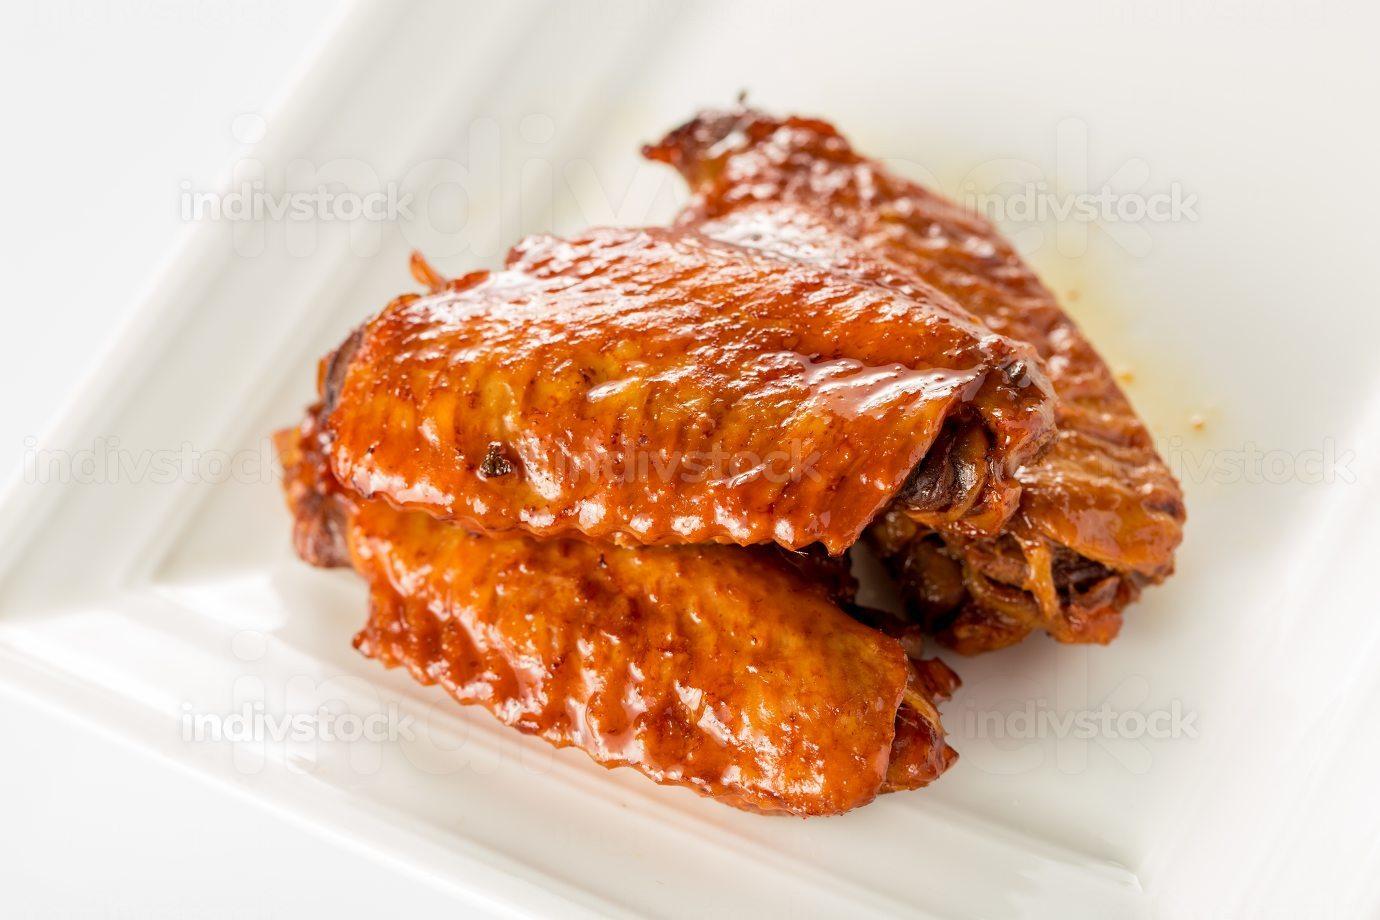 Chinese food, coke braised chicken wings